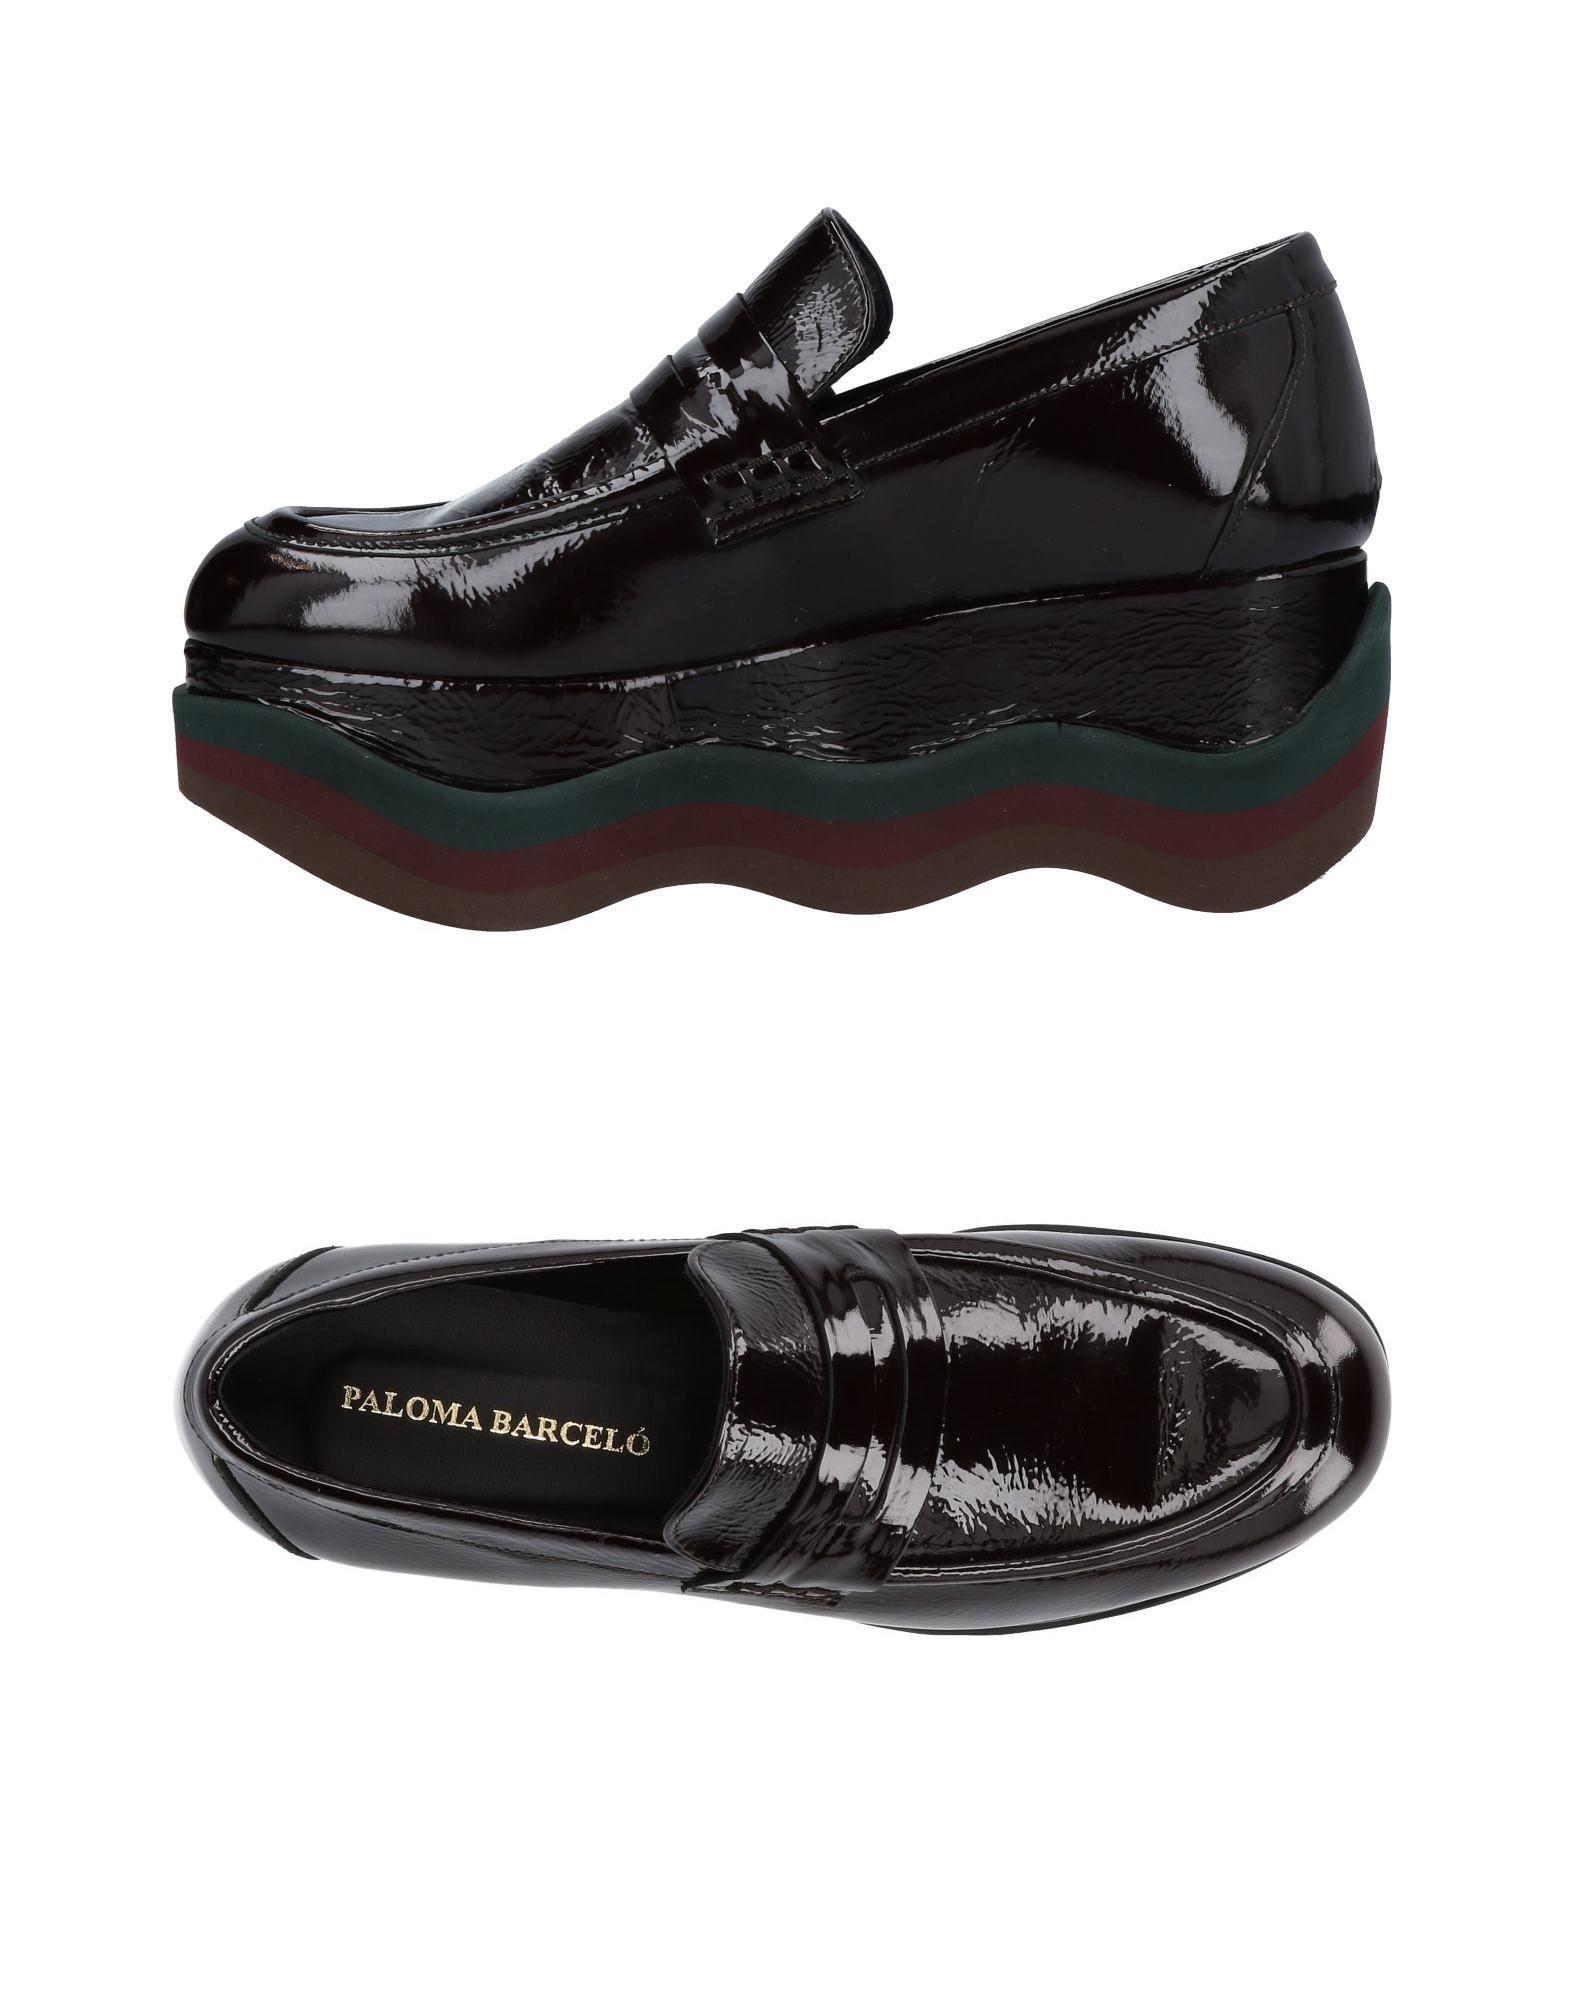 Paloma Barceló Mokassins Damen  11452543SXGut aussehende strapazierfähige Schuhe